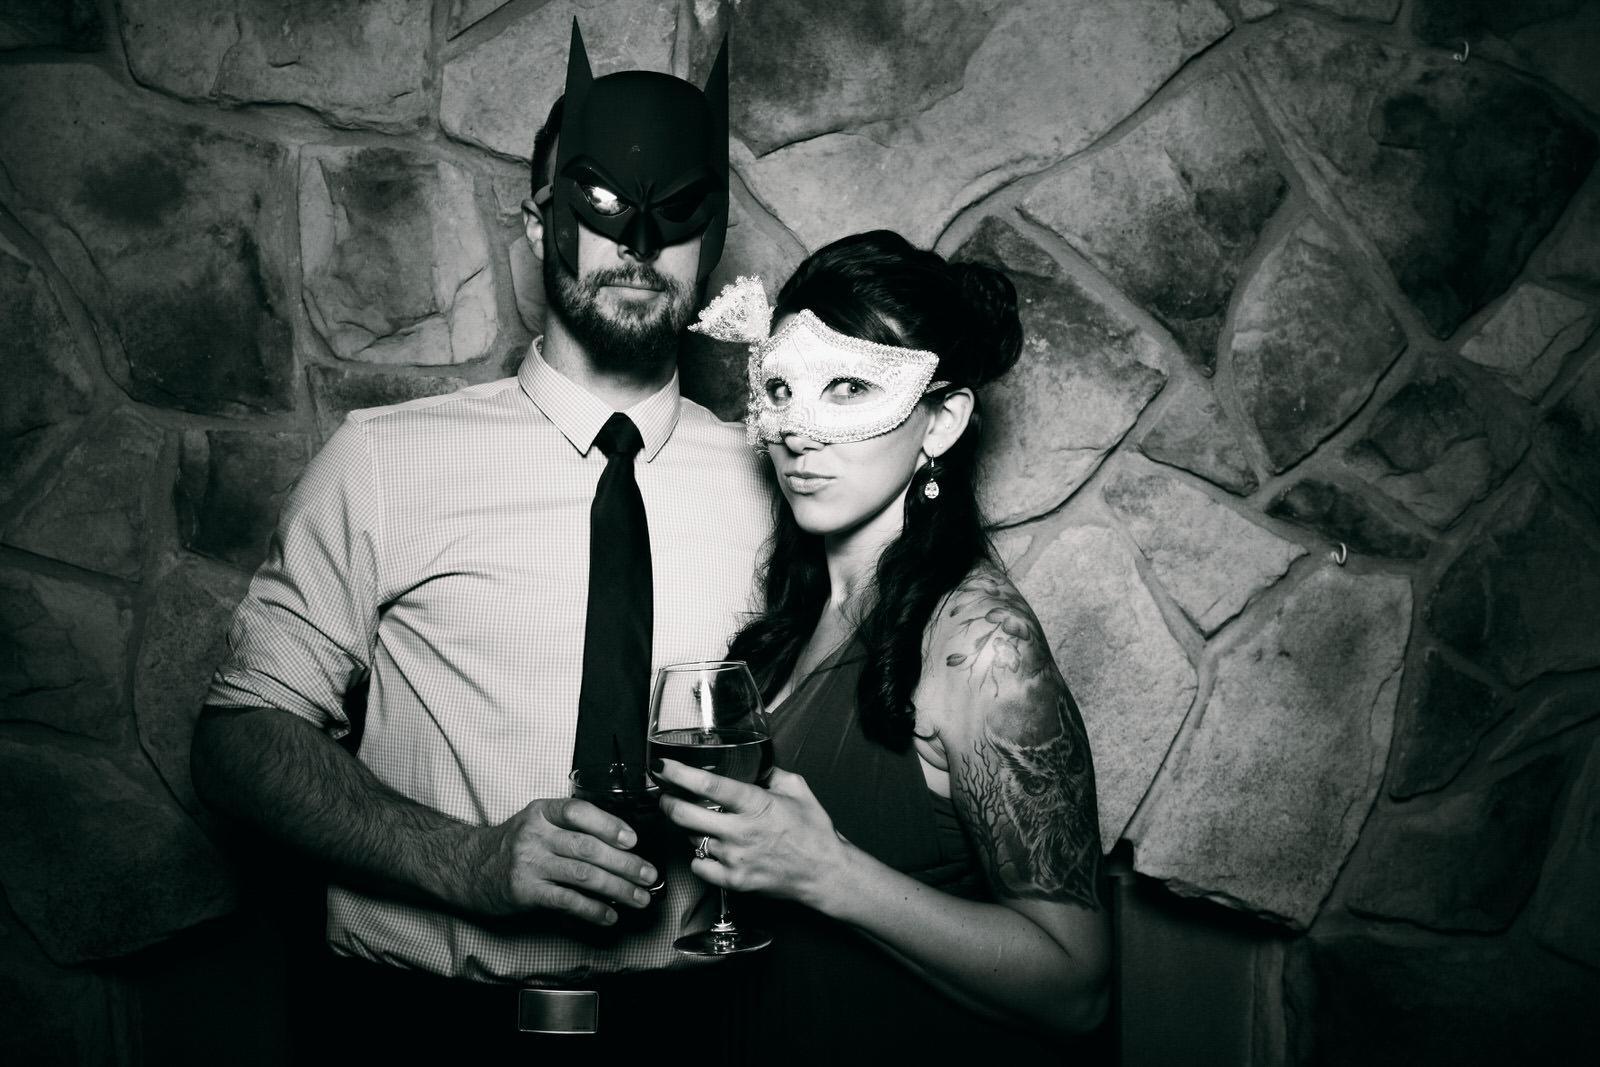 Jeanine-Sean-Wedding-Photo-Booth-5.jpg